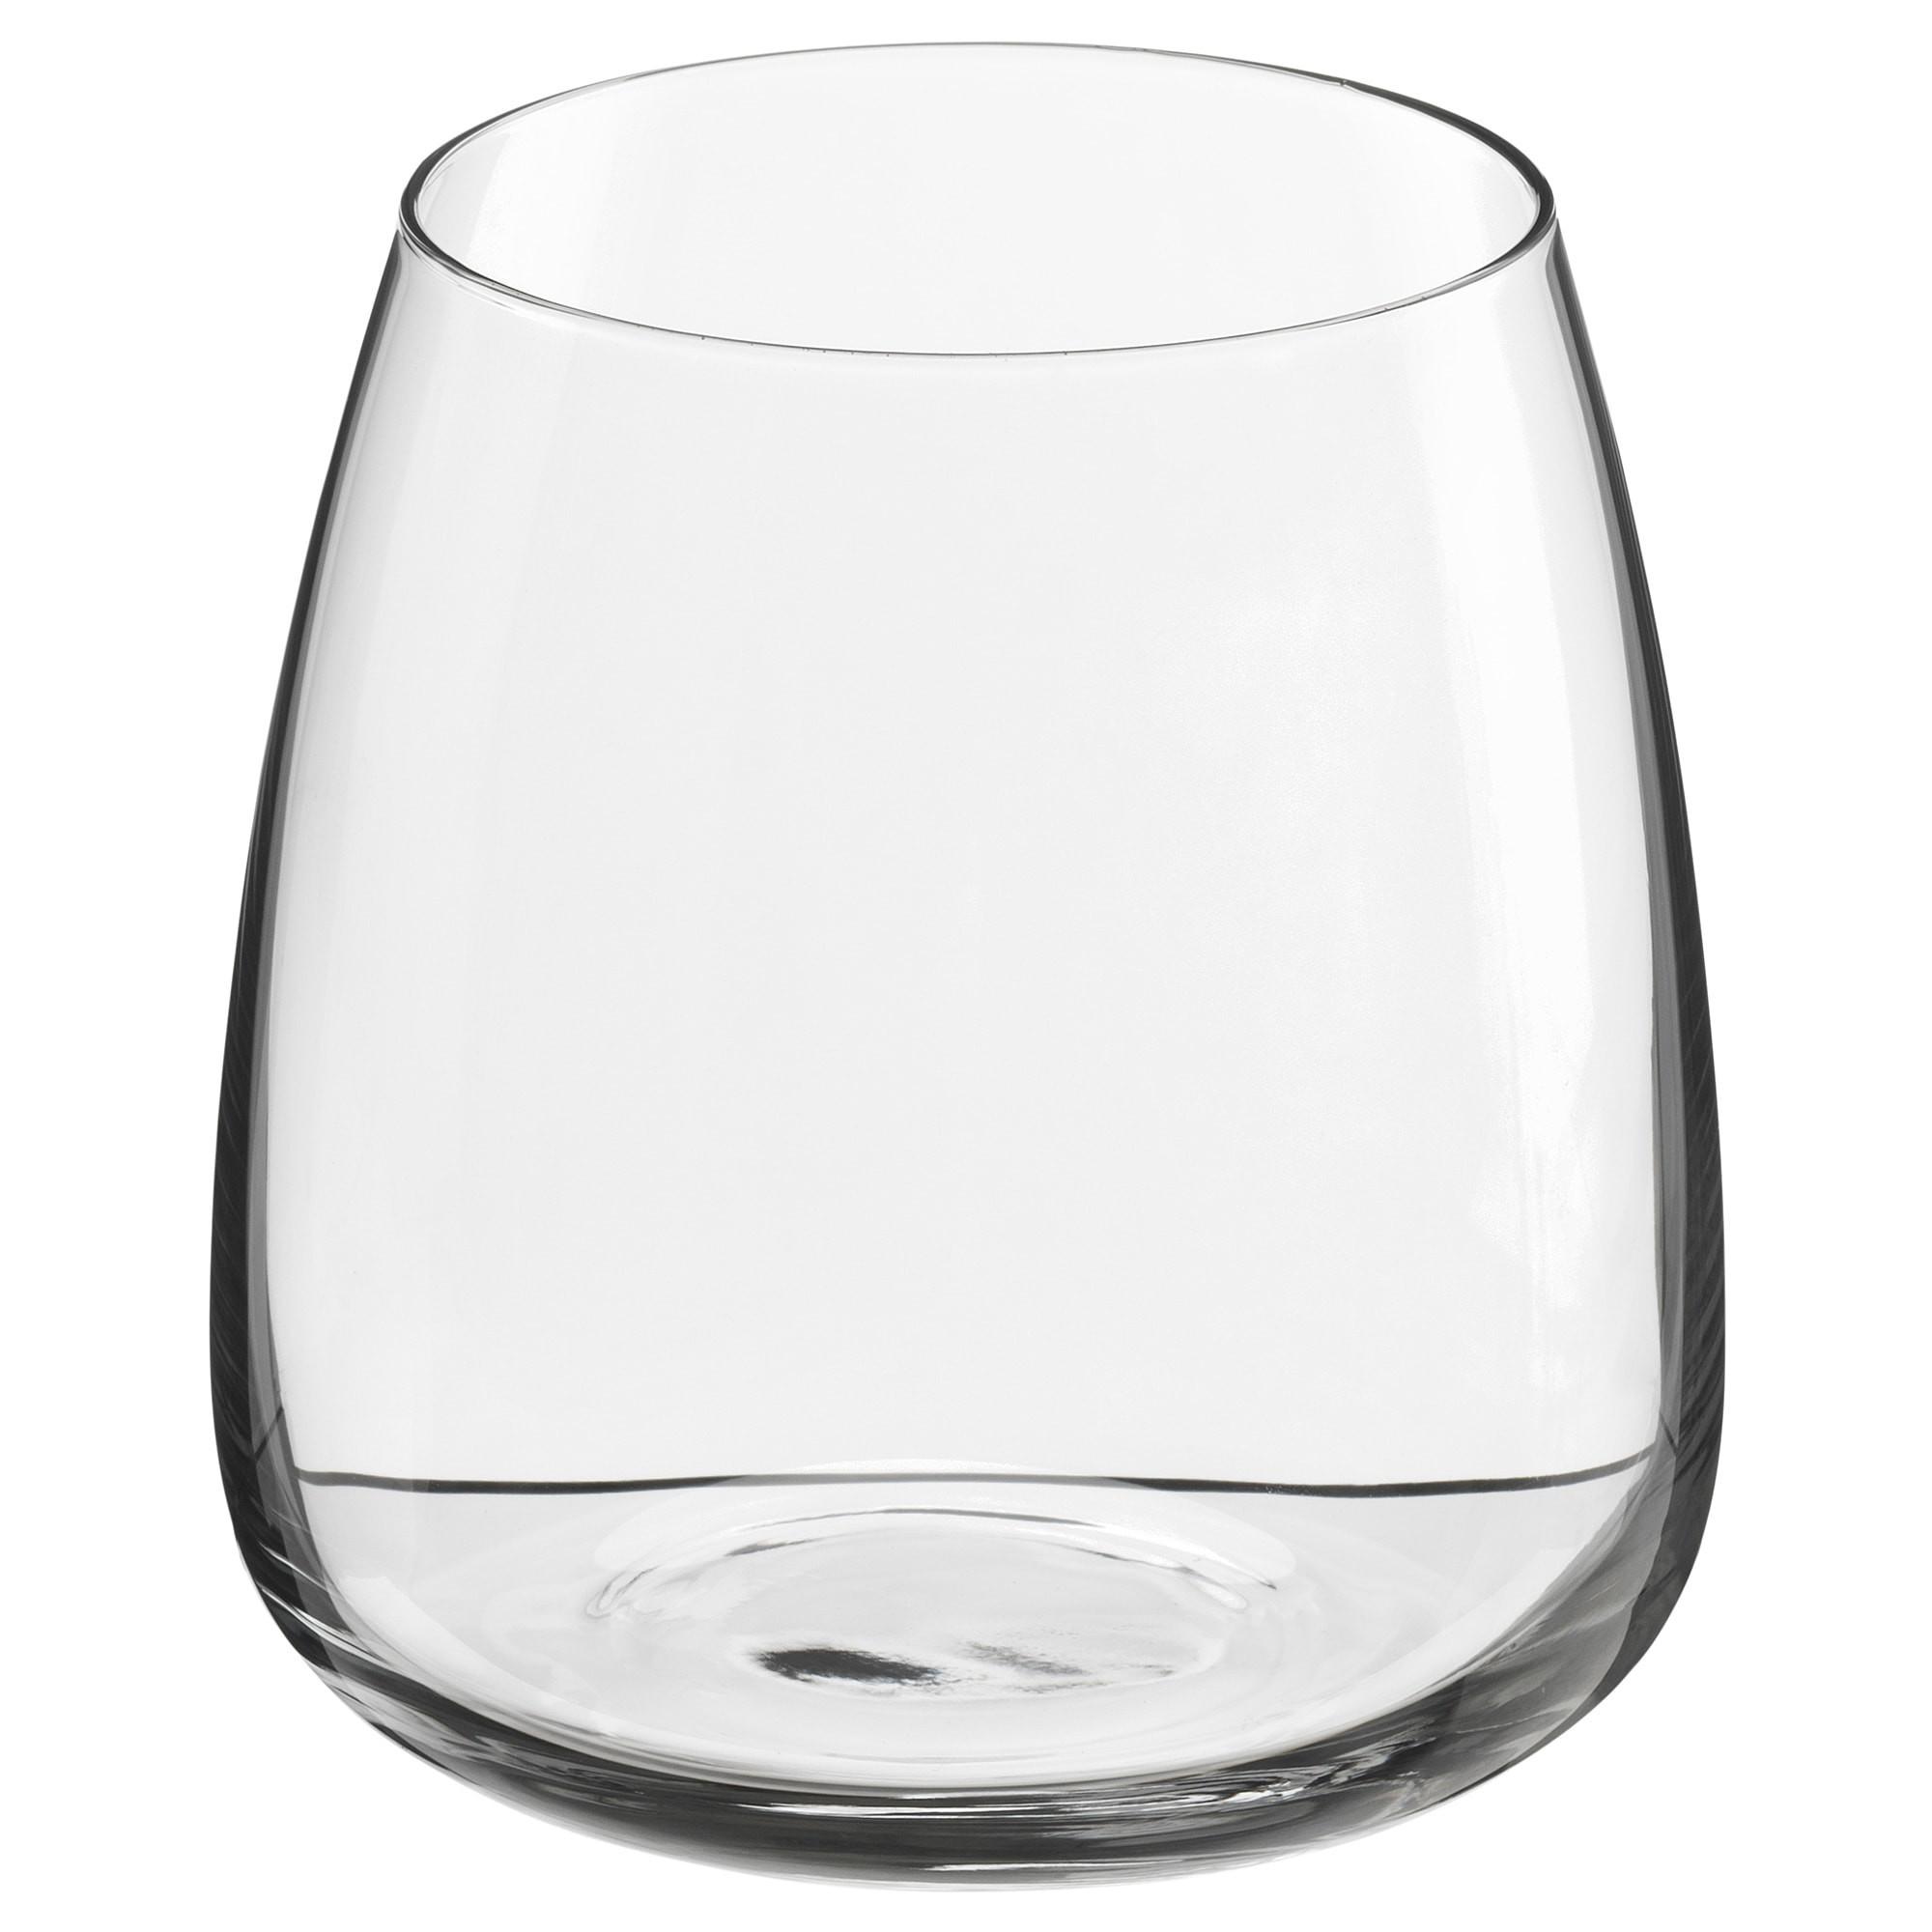 225 & 10 attractive Ikea Rectangular Glass Vase | Decorative vase ...